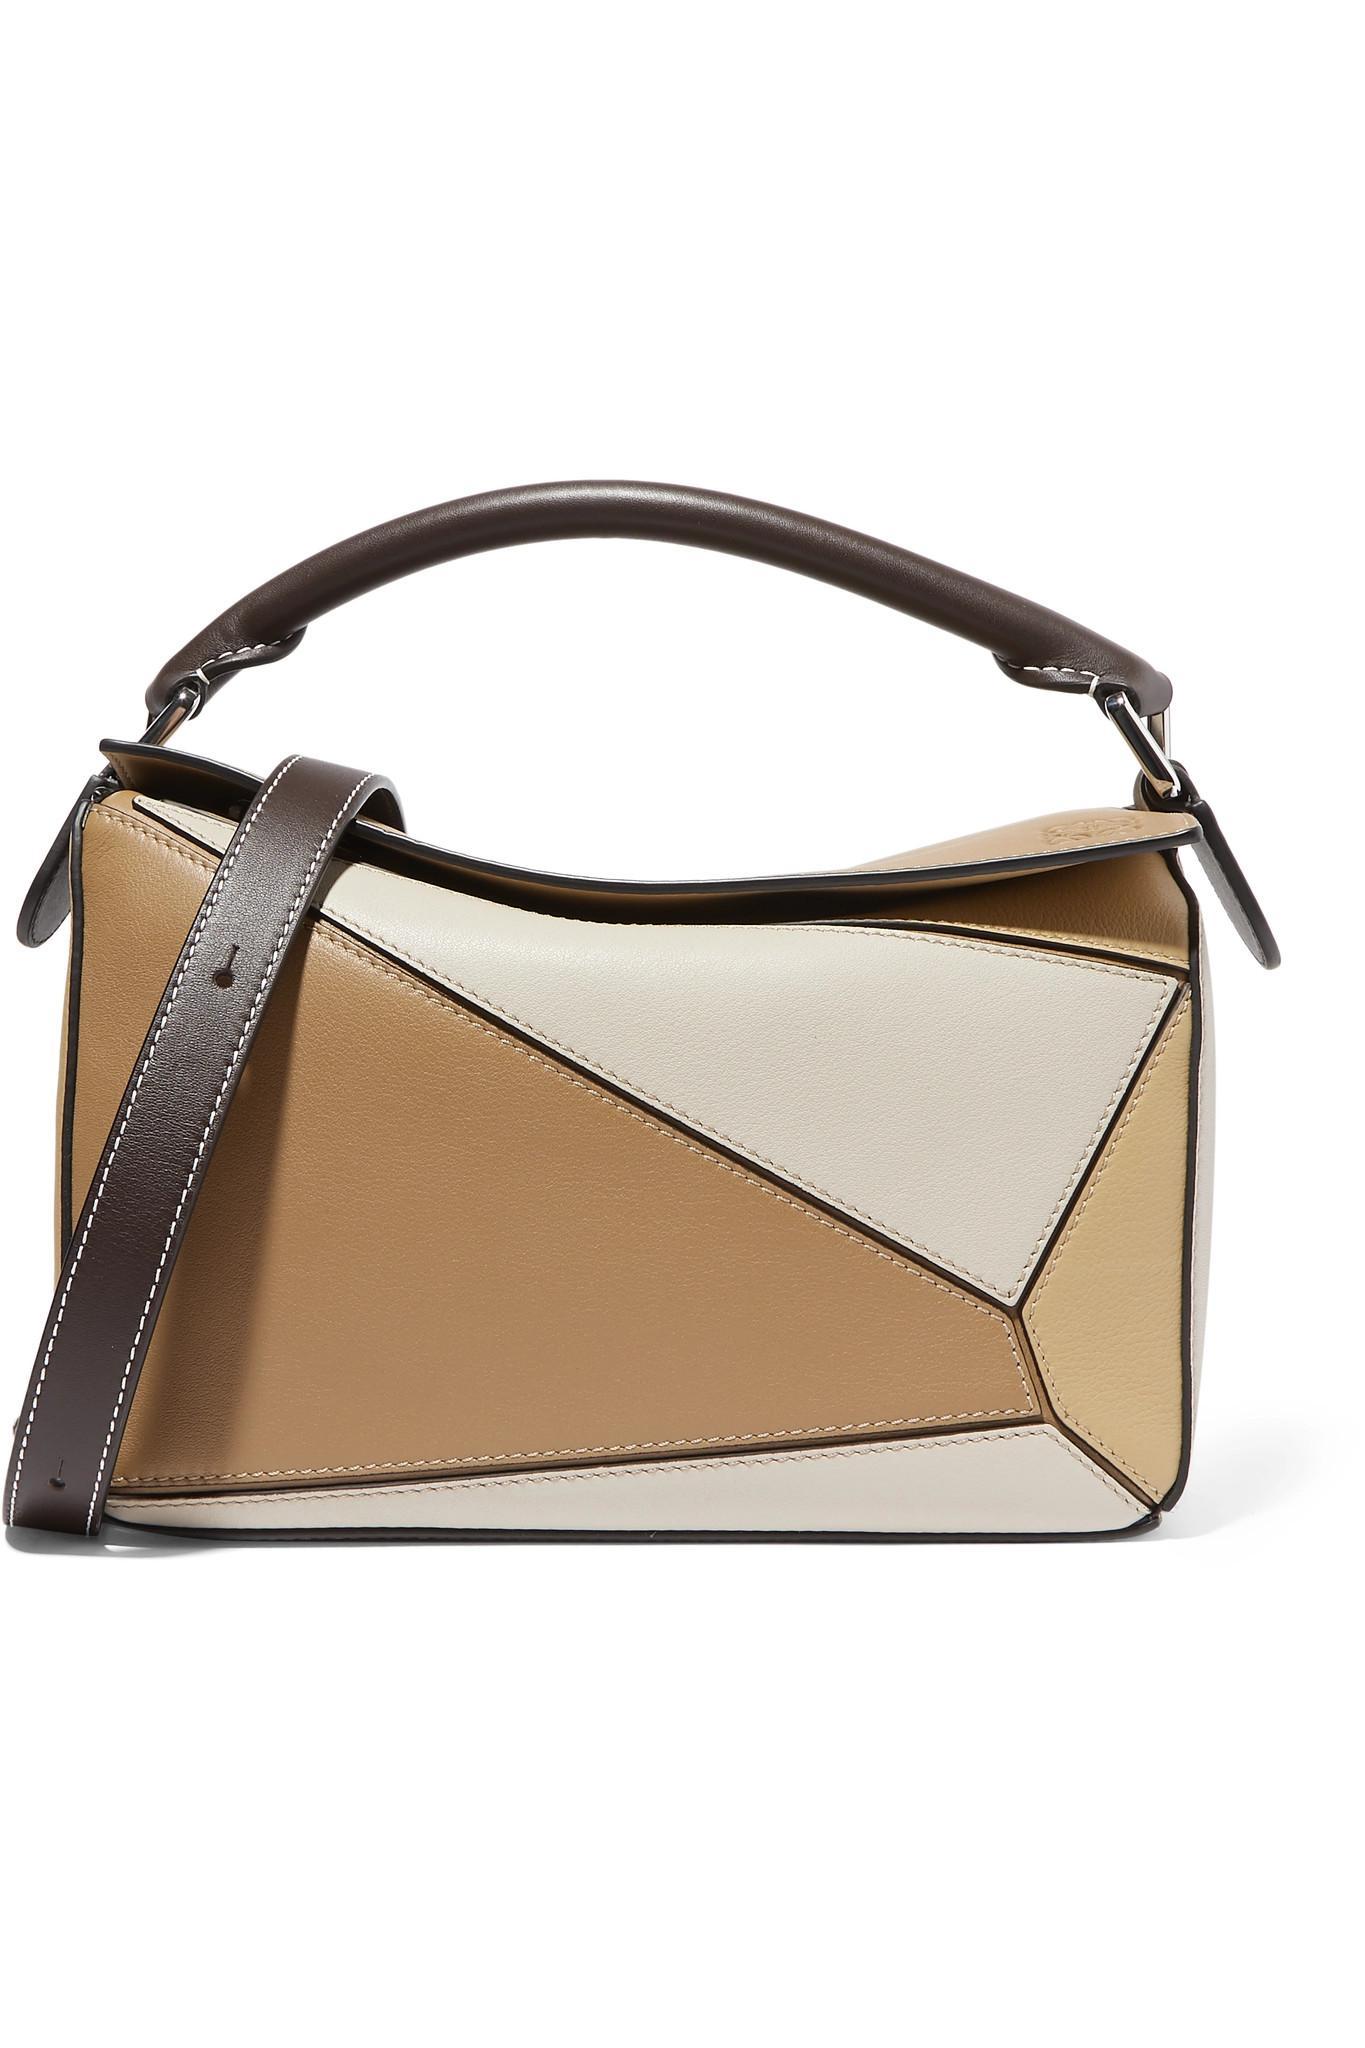 0344d369916c Loewe. Women s Natural Puzzle Small Color-block Textured-leather Shoulder  Bag